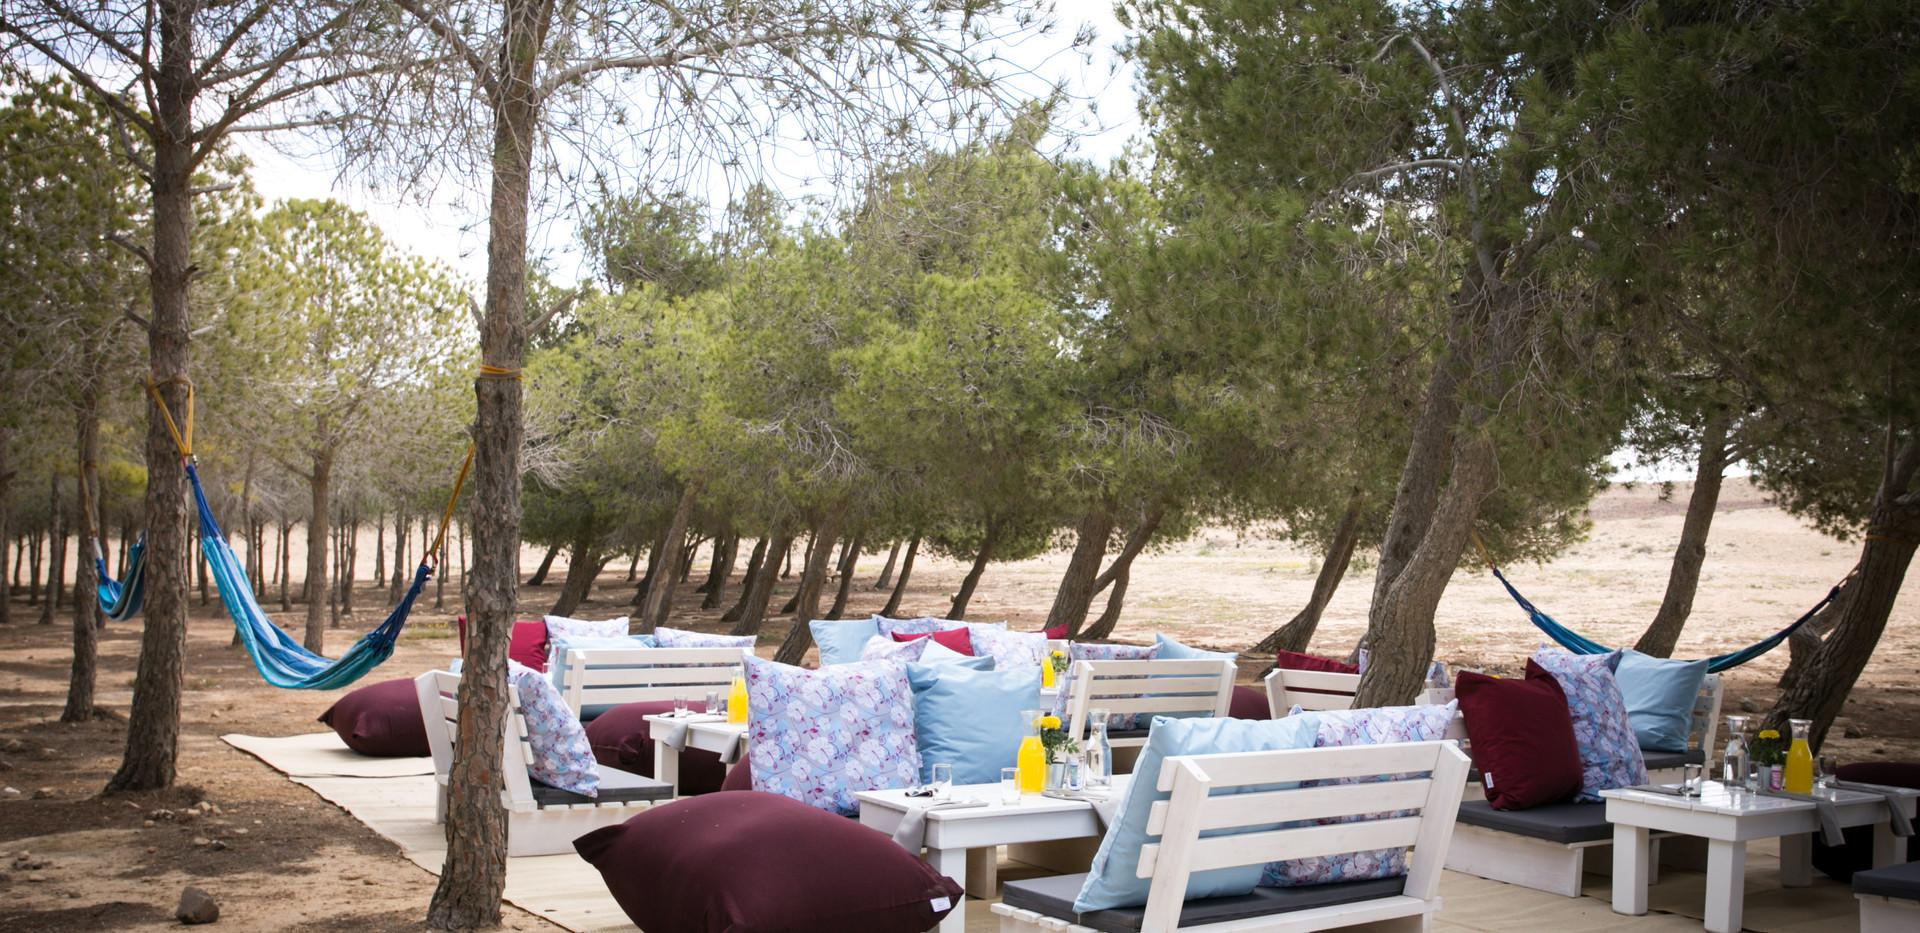 Events in Mitzpe ramon desert Israel